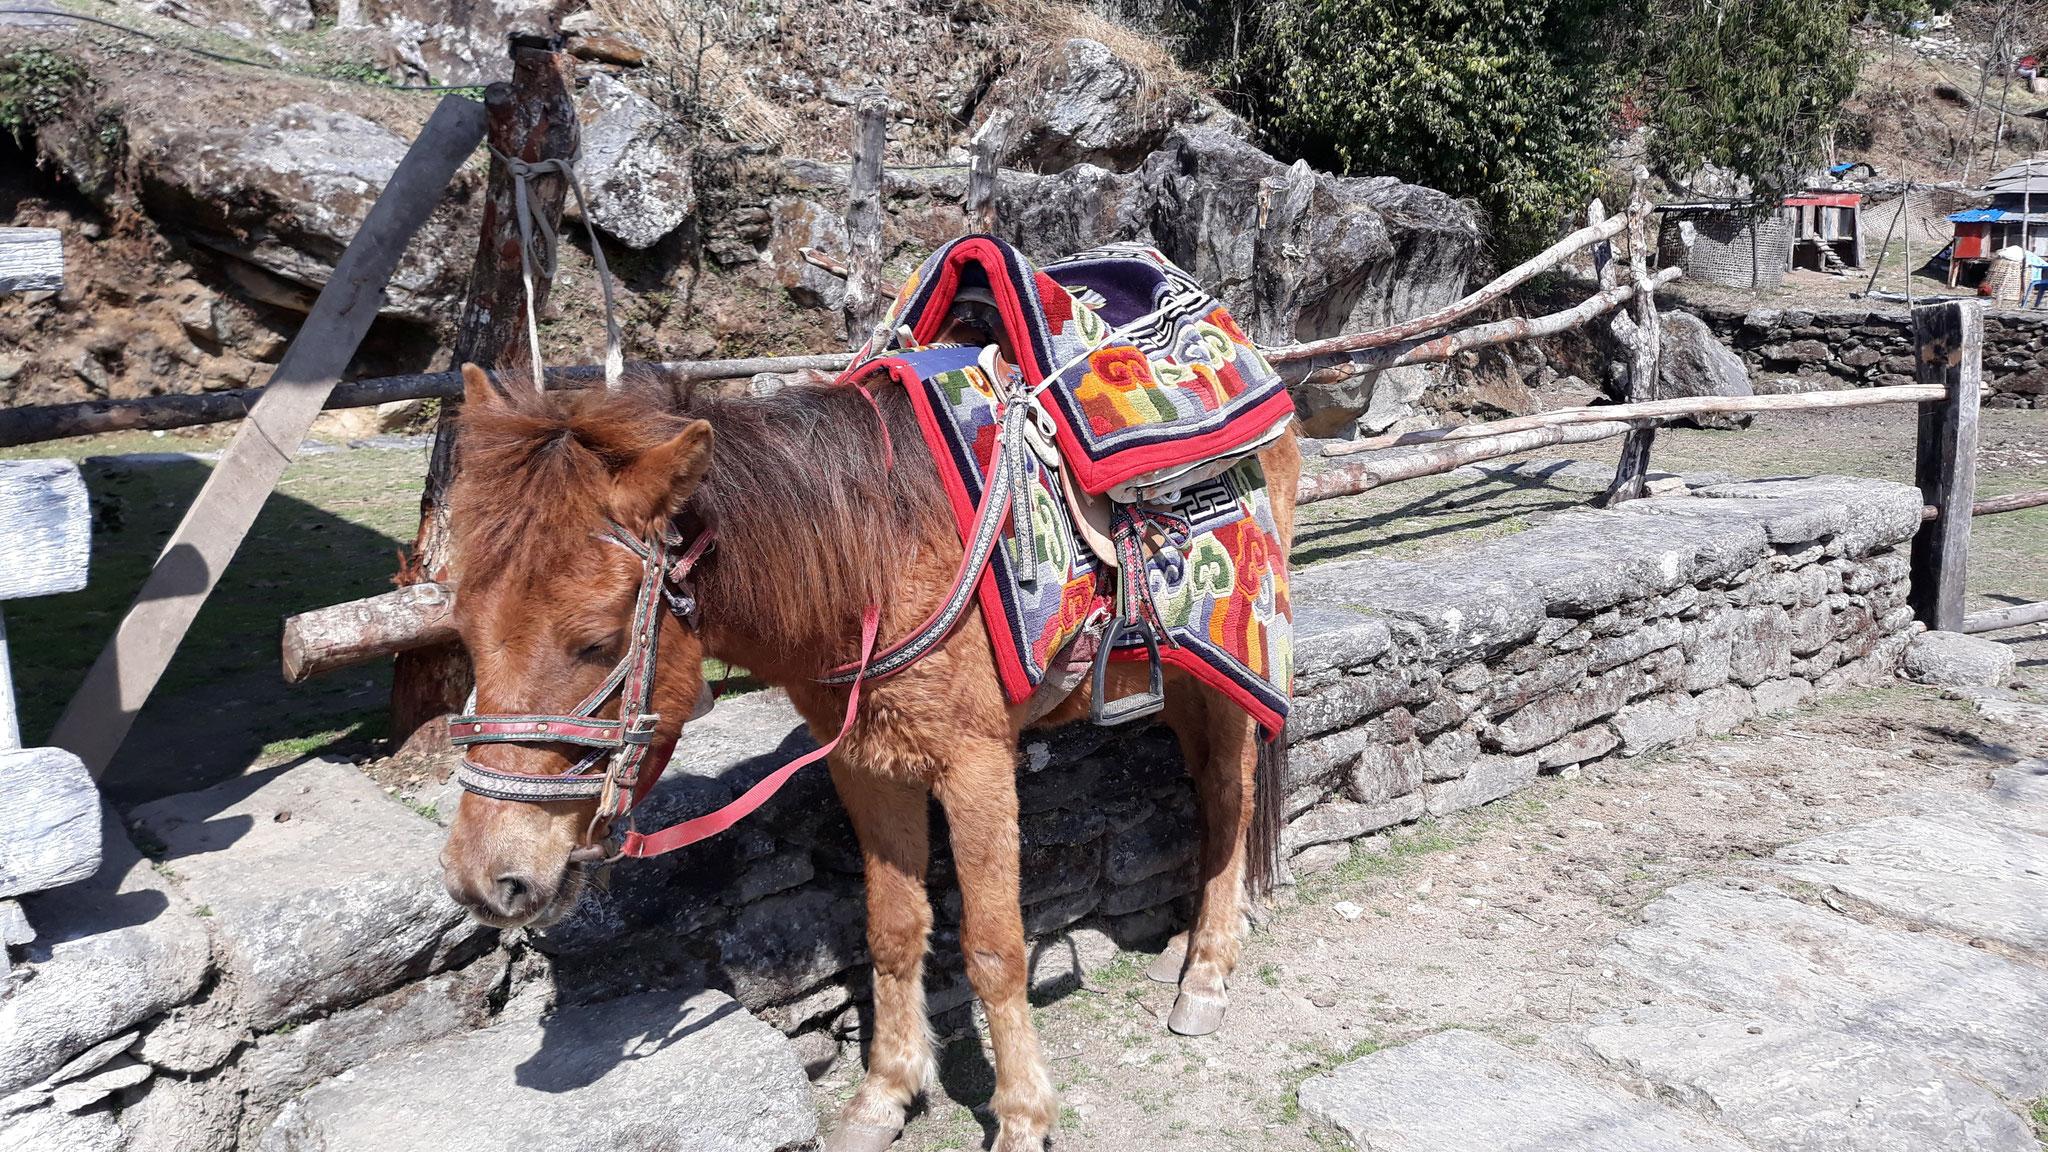 Poon Hill möglich per Pony Express